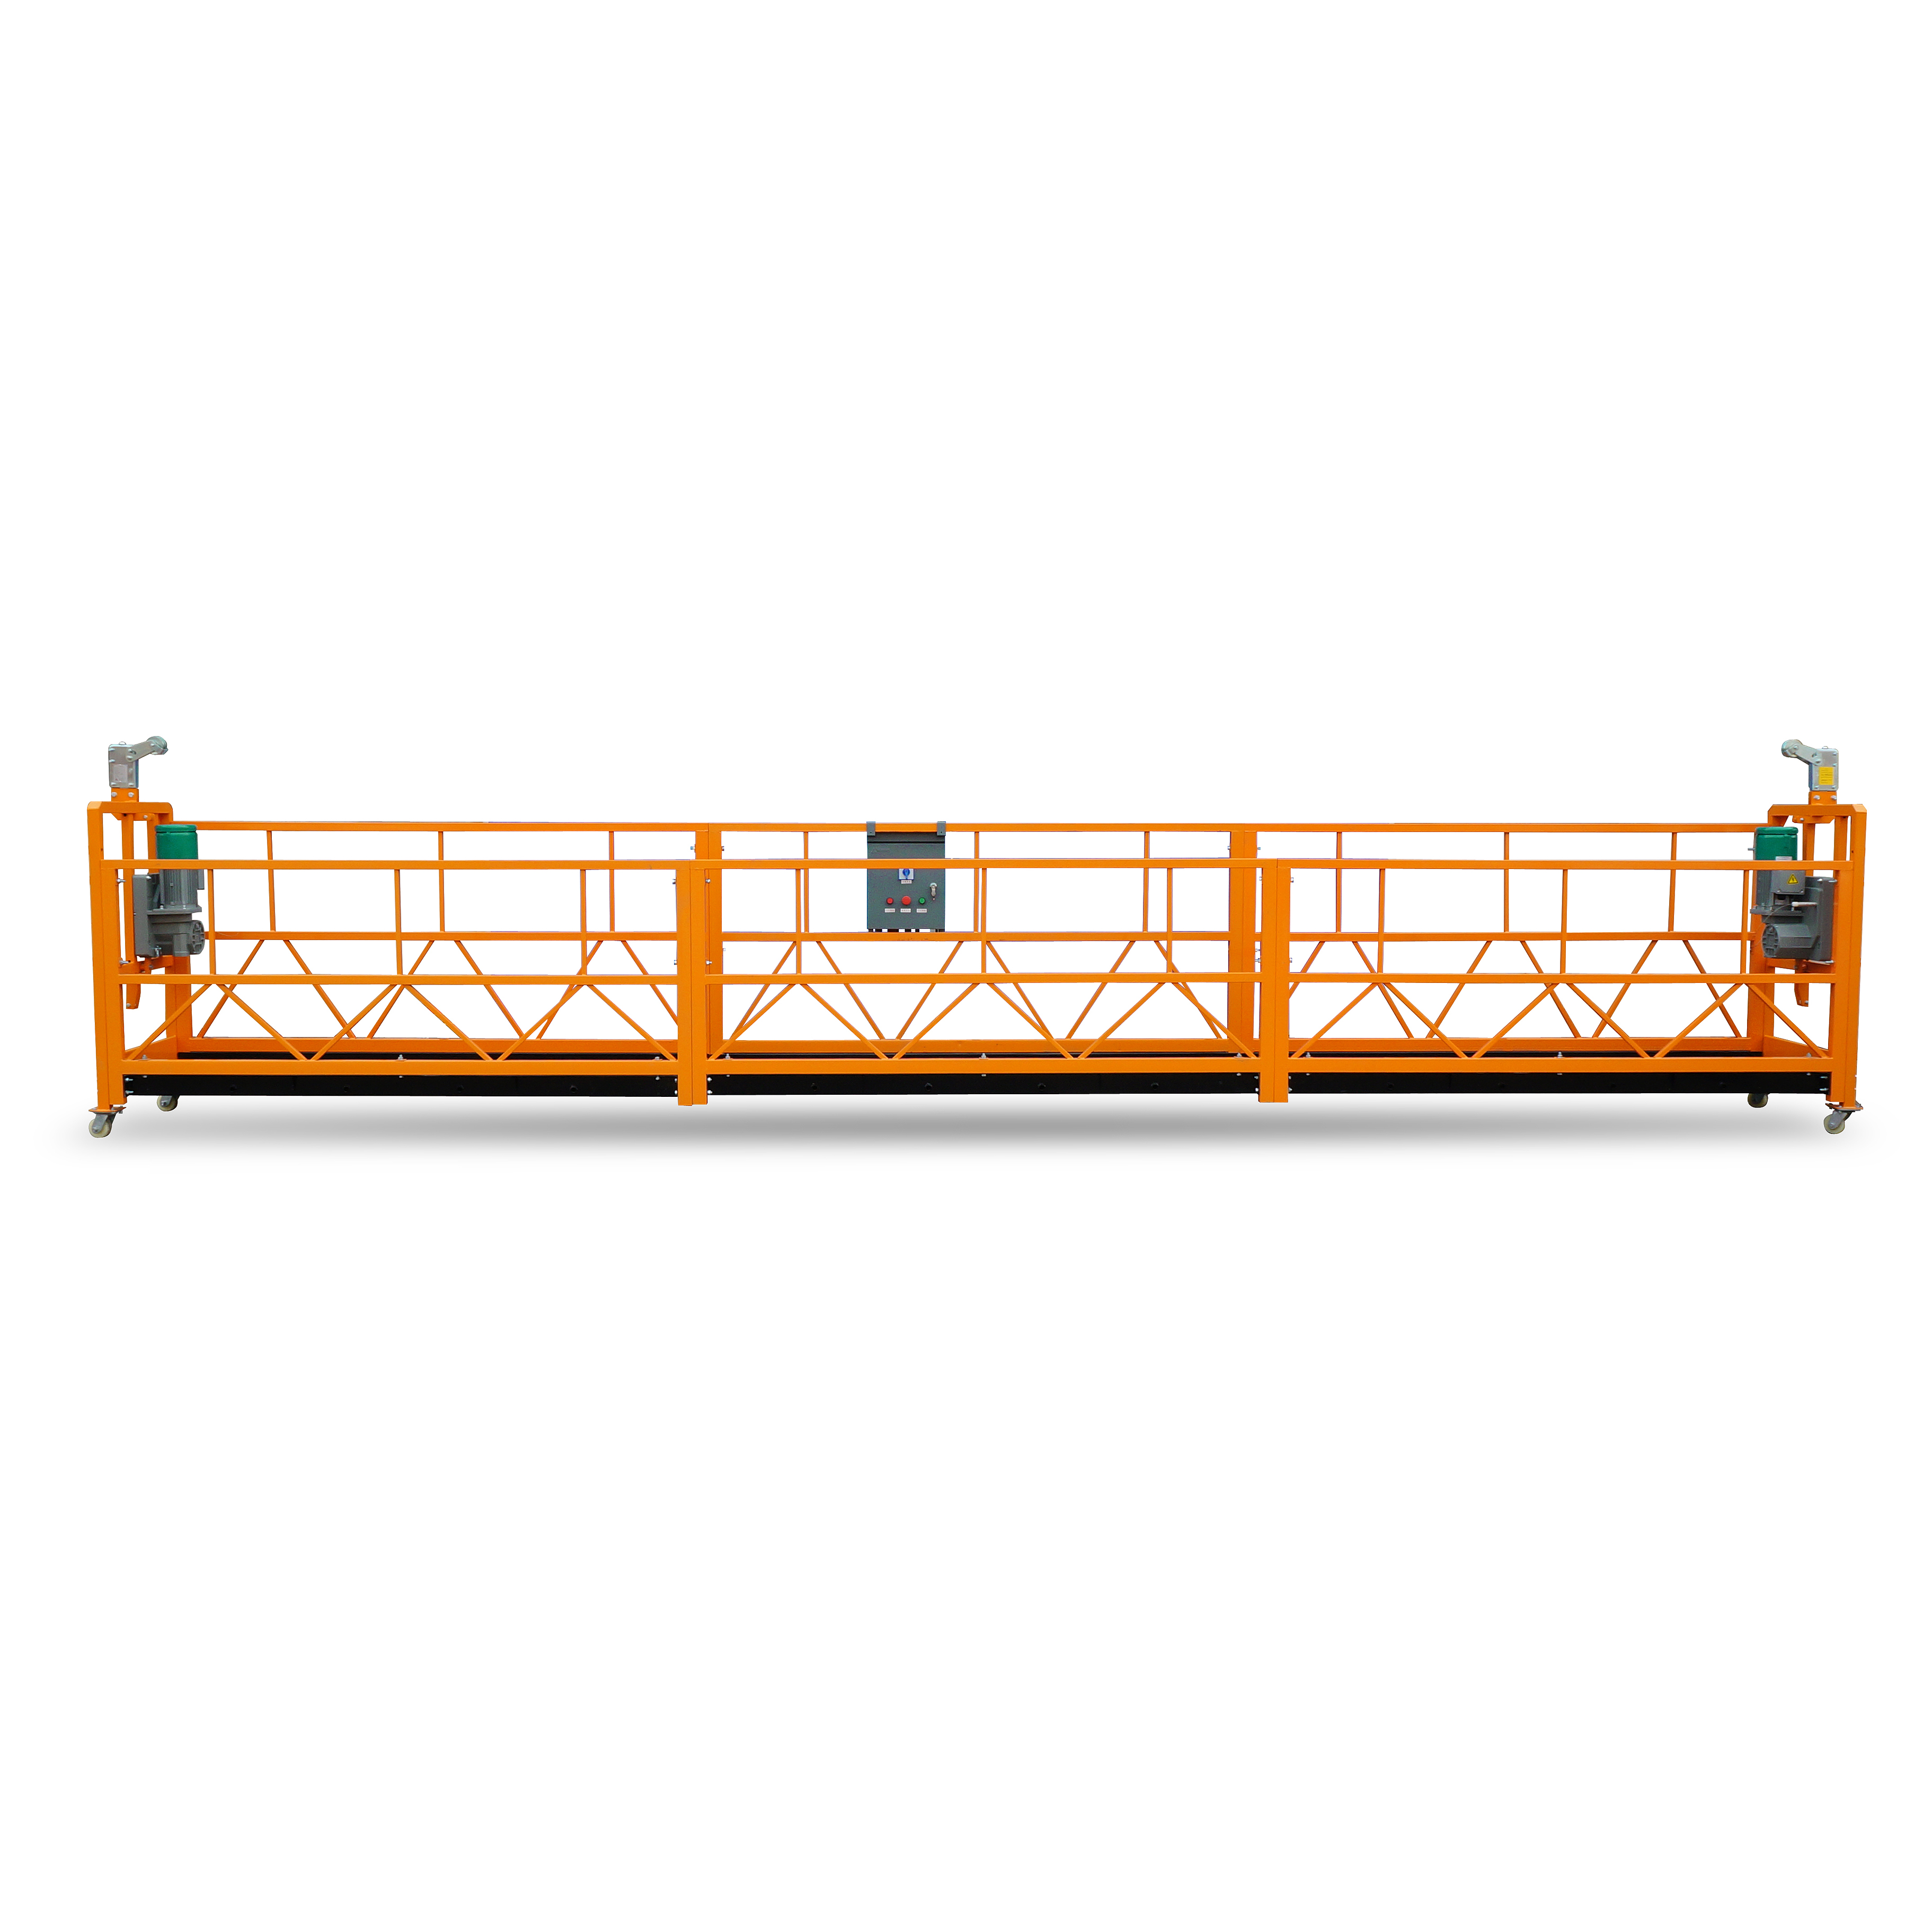 ZLP1000 suspended platform